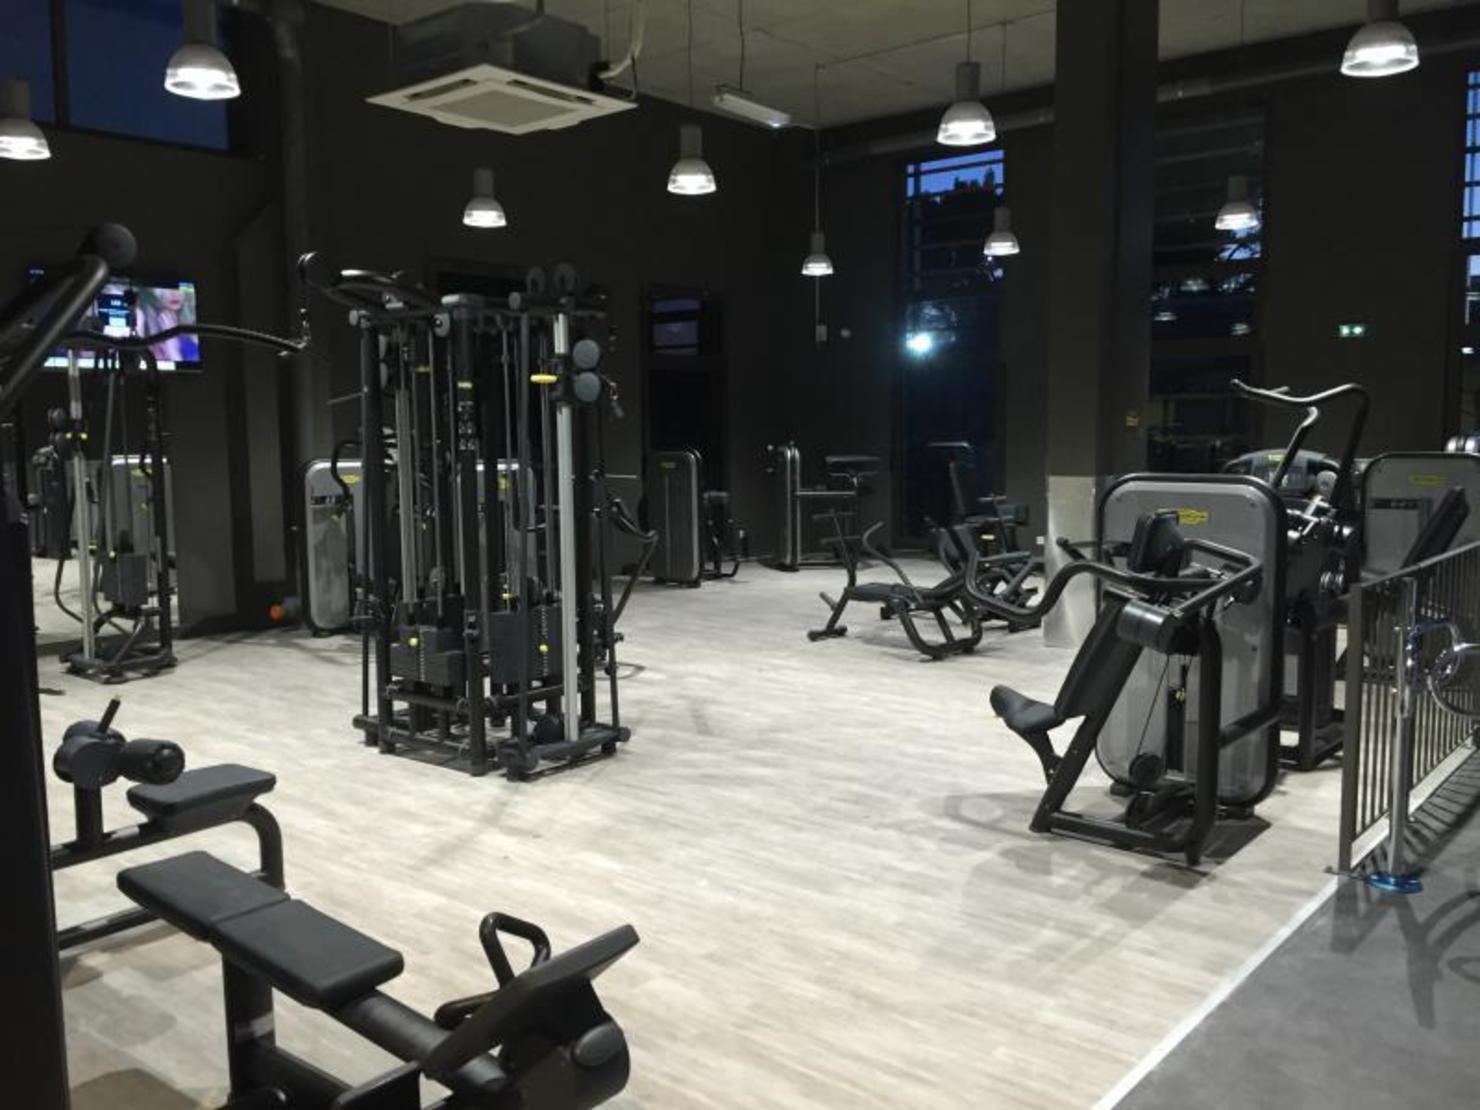 Fitness park salon de provence salon de provence - Club salon de provence ...